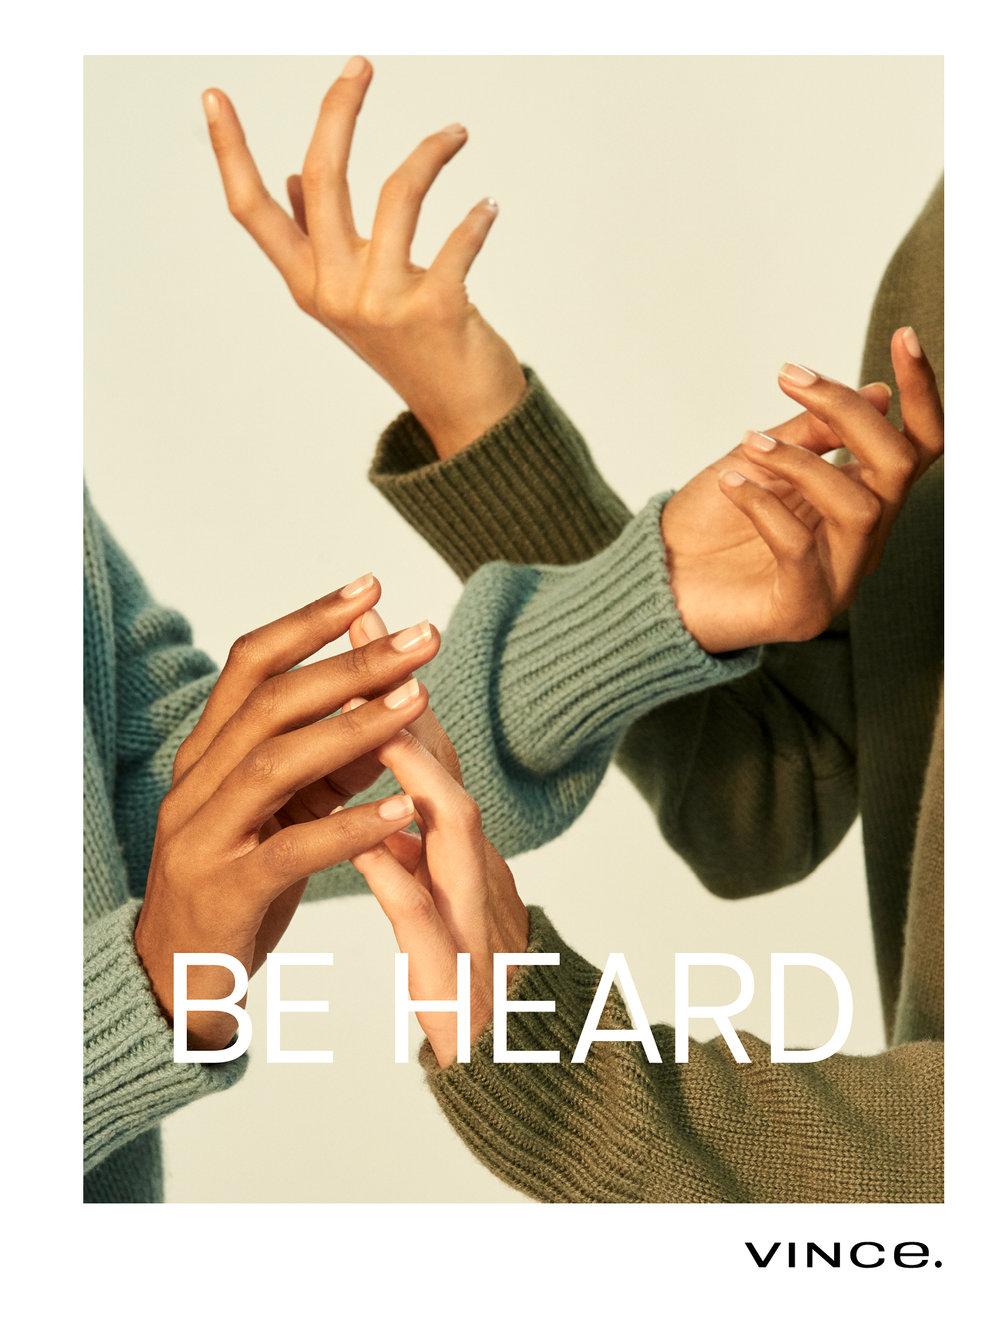 #vince #julianoni #fw17 #campaign #martemeivanhaaster #jimkaemmerling #aleciamorais #tamaramcnaughton #chihoomae #vittoriacerciello